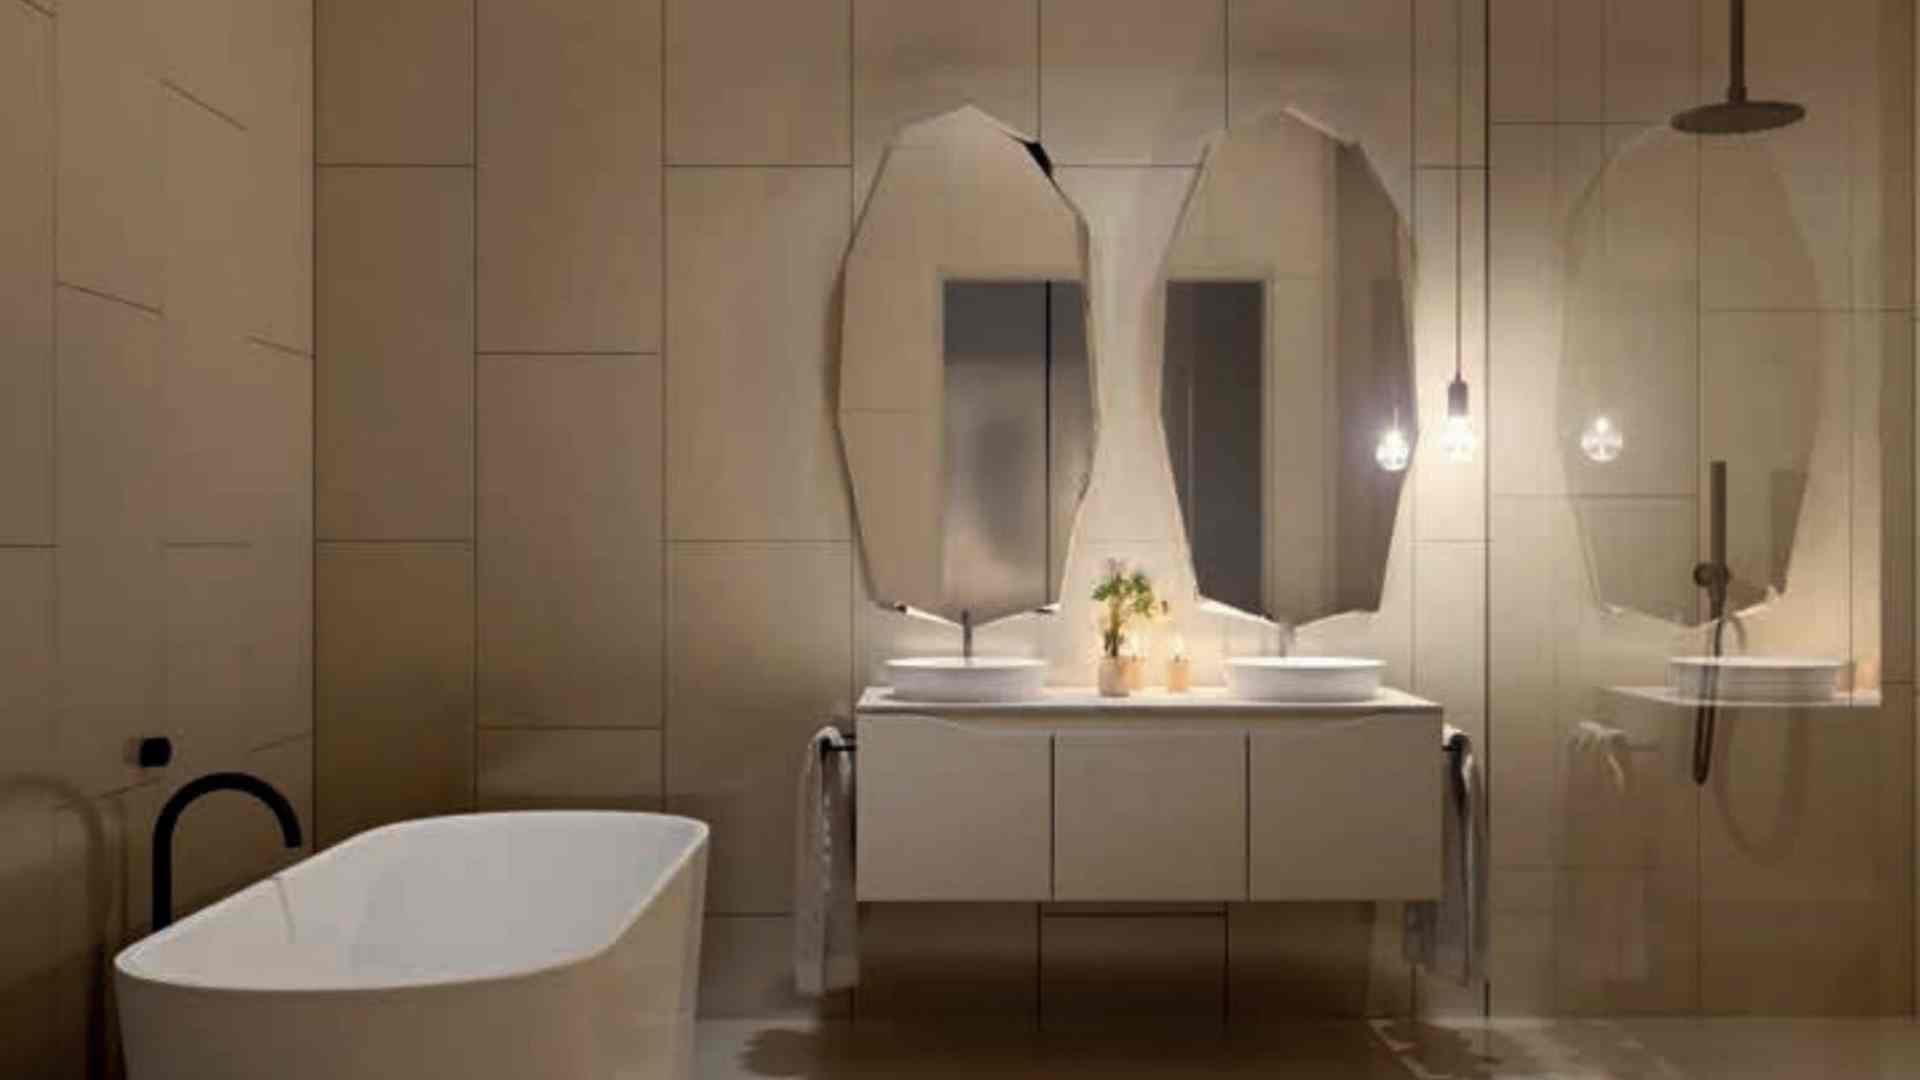 white tub with black faucet, beige tile bathroom